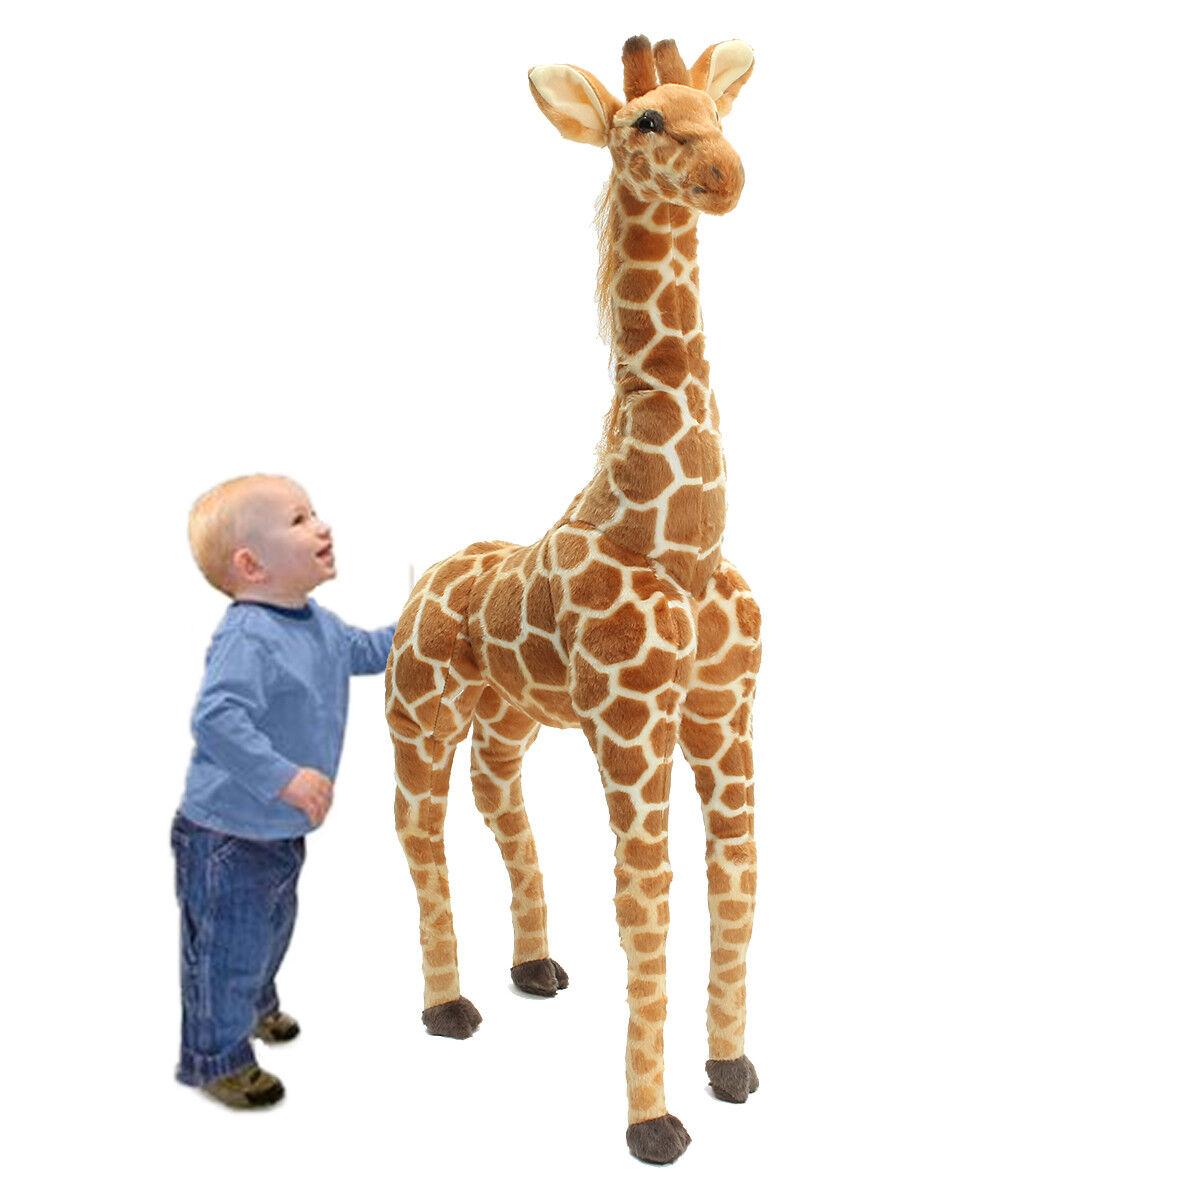 US Big Plush Giraffe Toy Doll Giant Large Stuffed Animal Soft Doll Kid Gift 40''